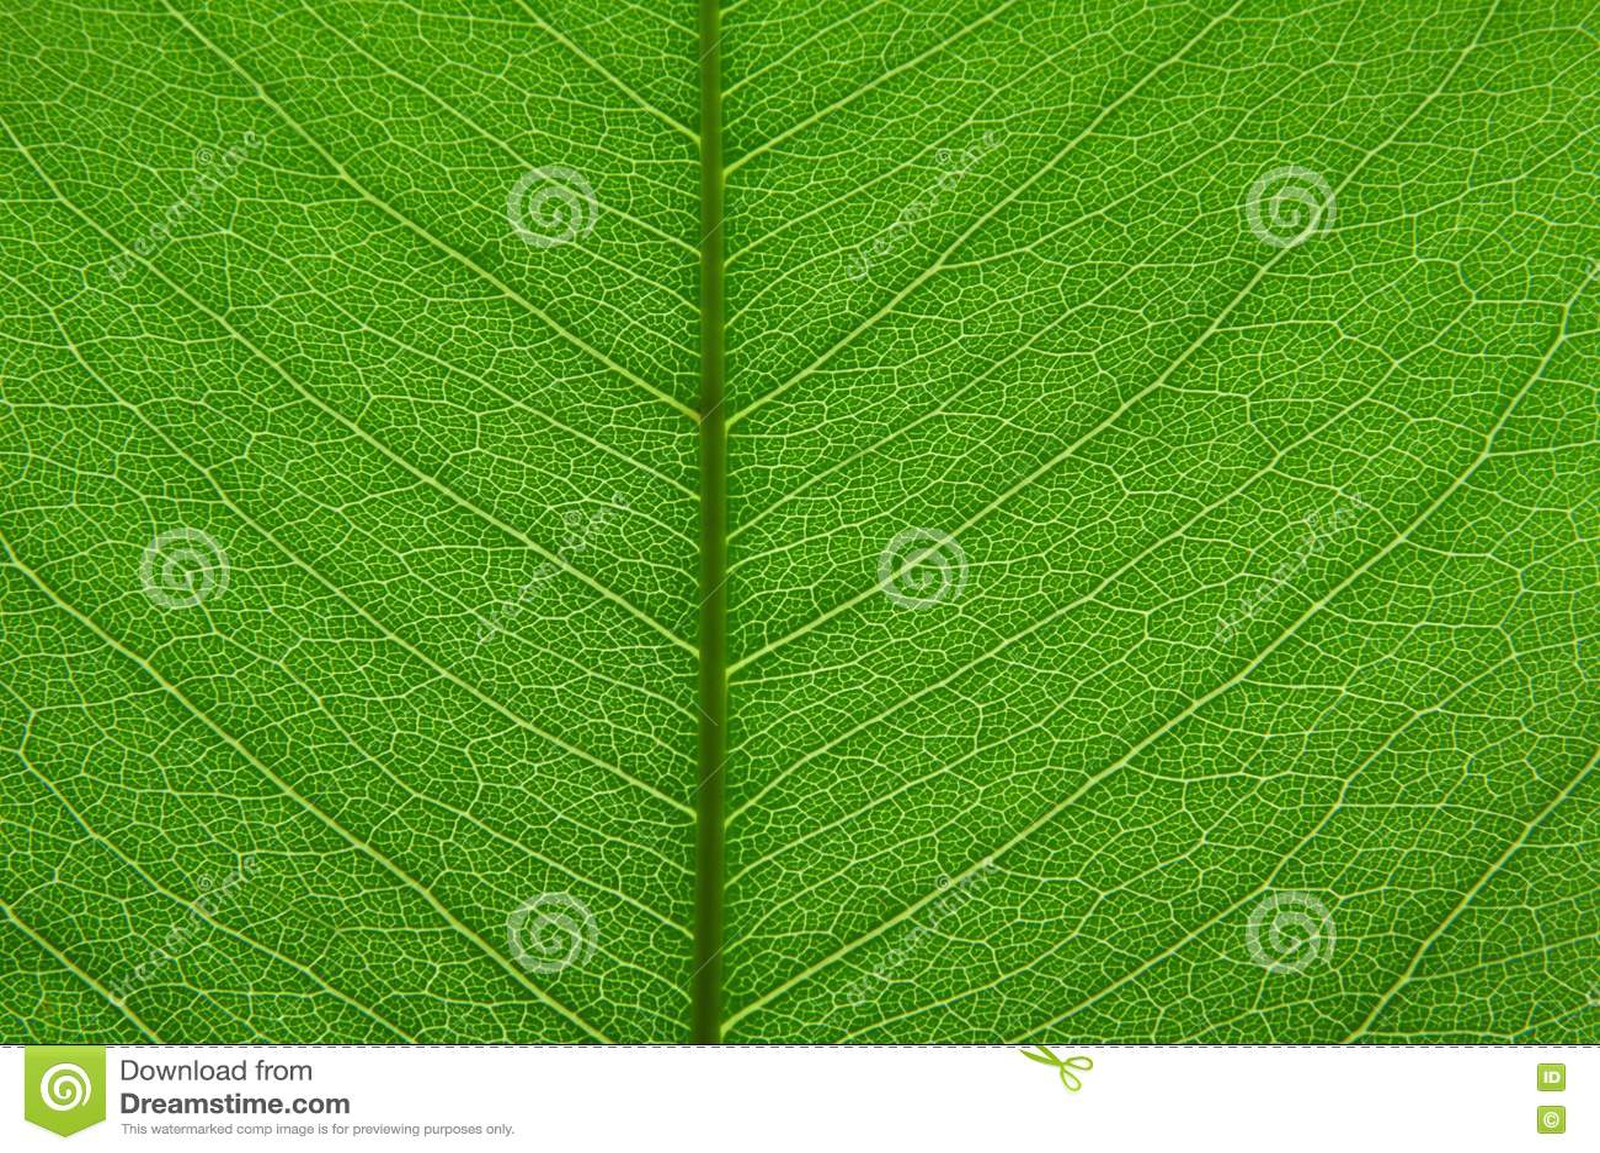 Transparent green leaf texture